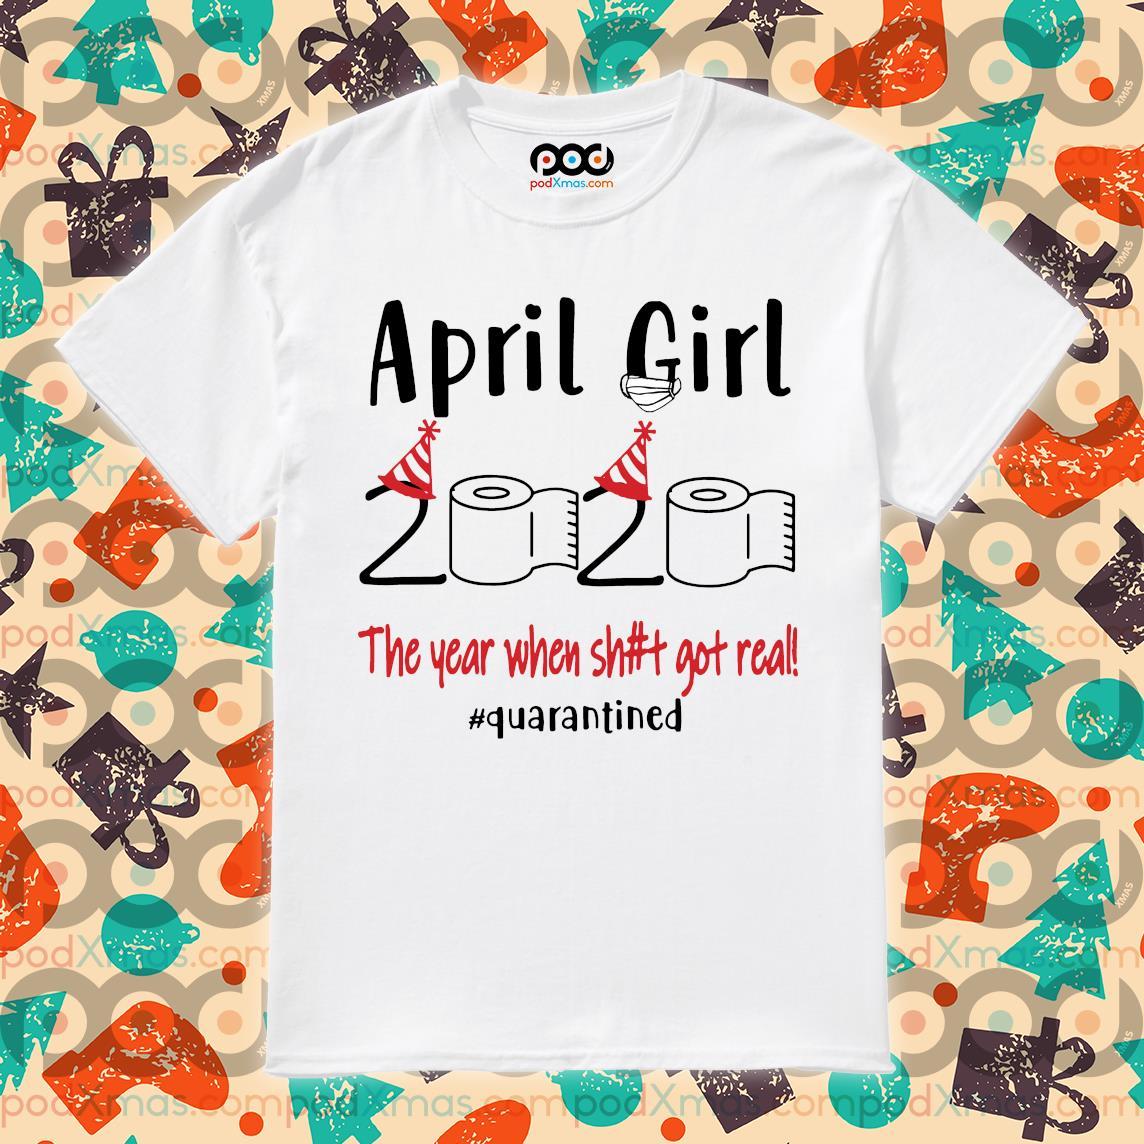 April girl 2020 the year where shit got real shirt